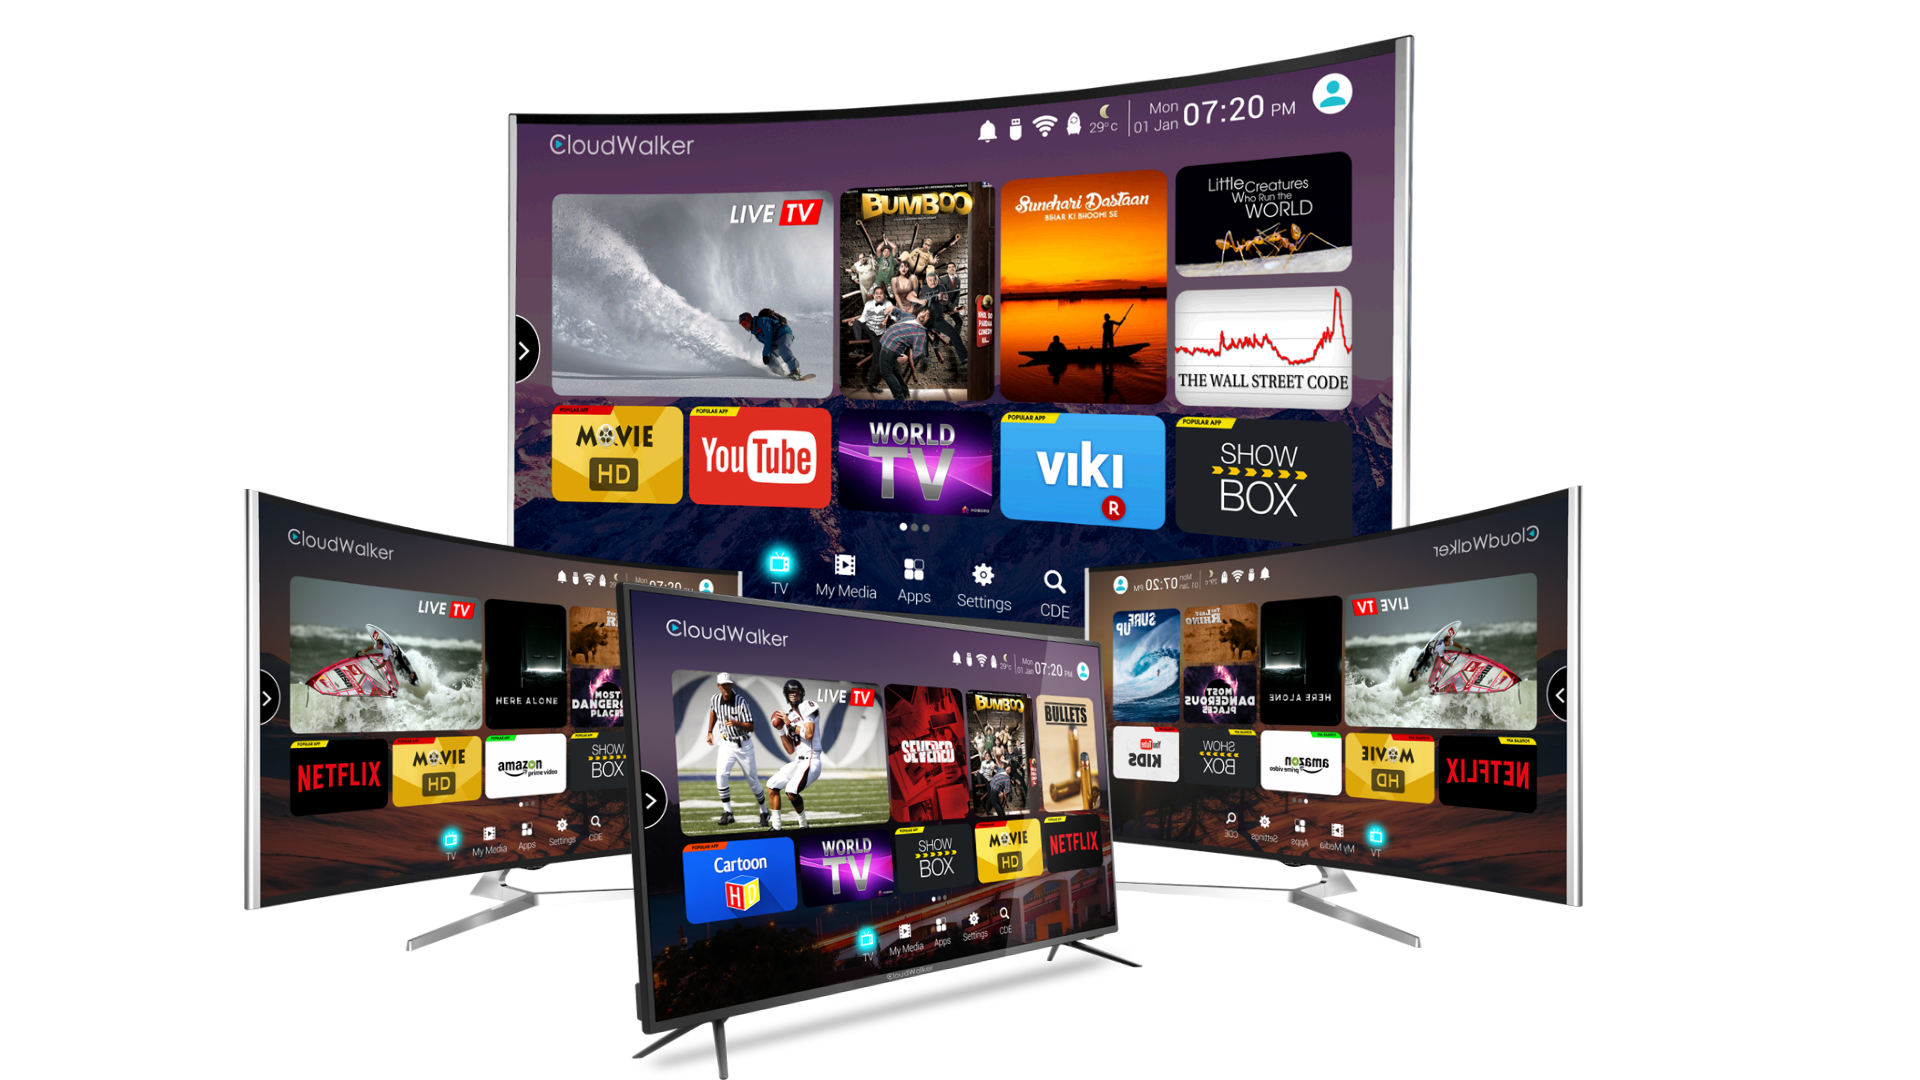 Perusahaan Terbesar Jual Chipset IP TV Online